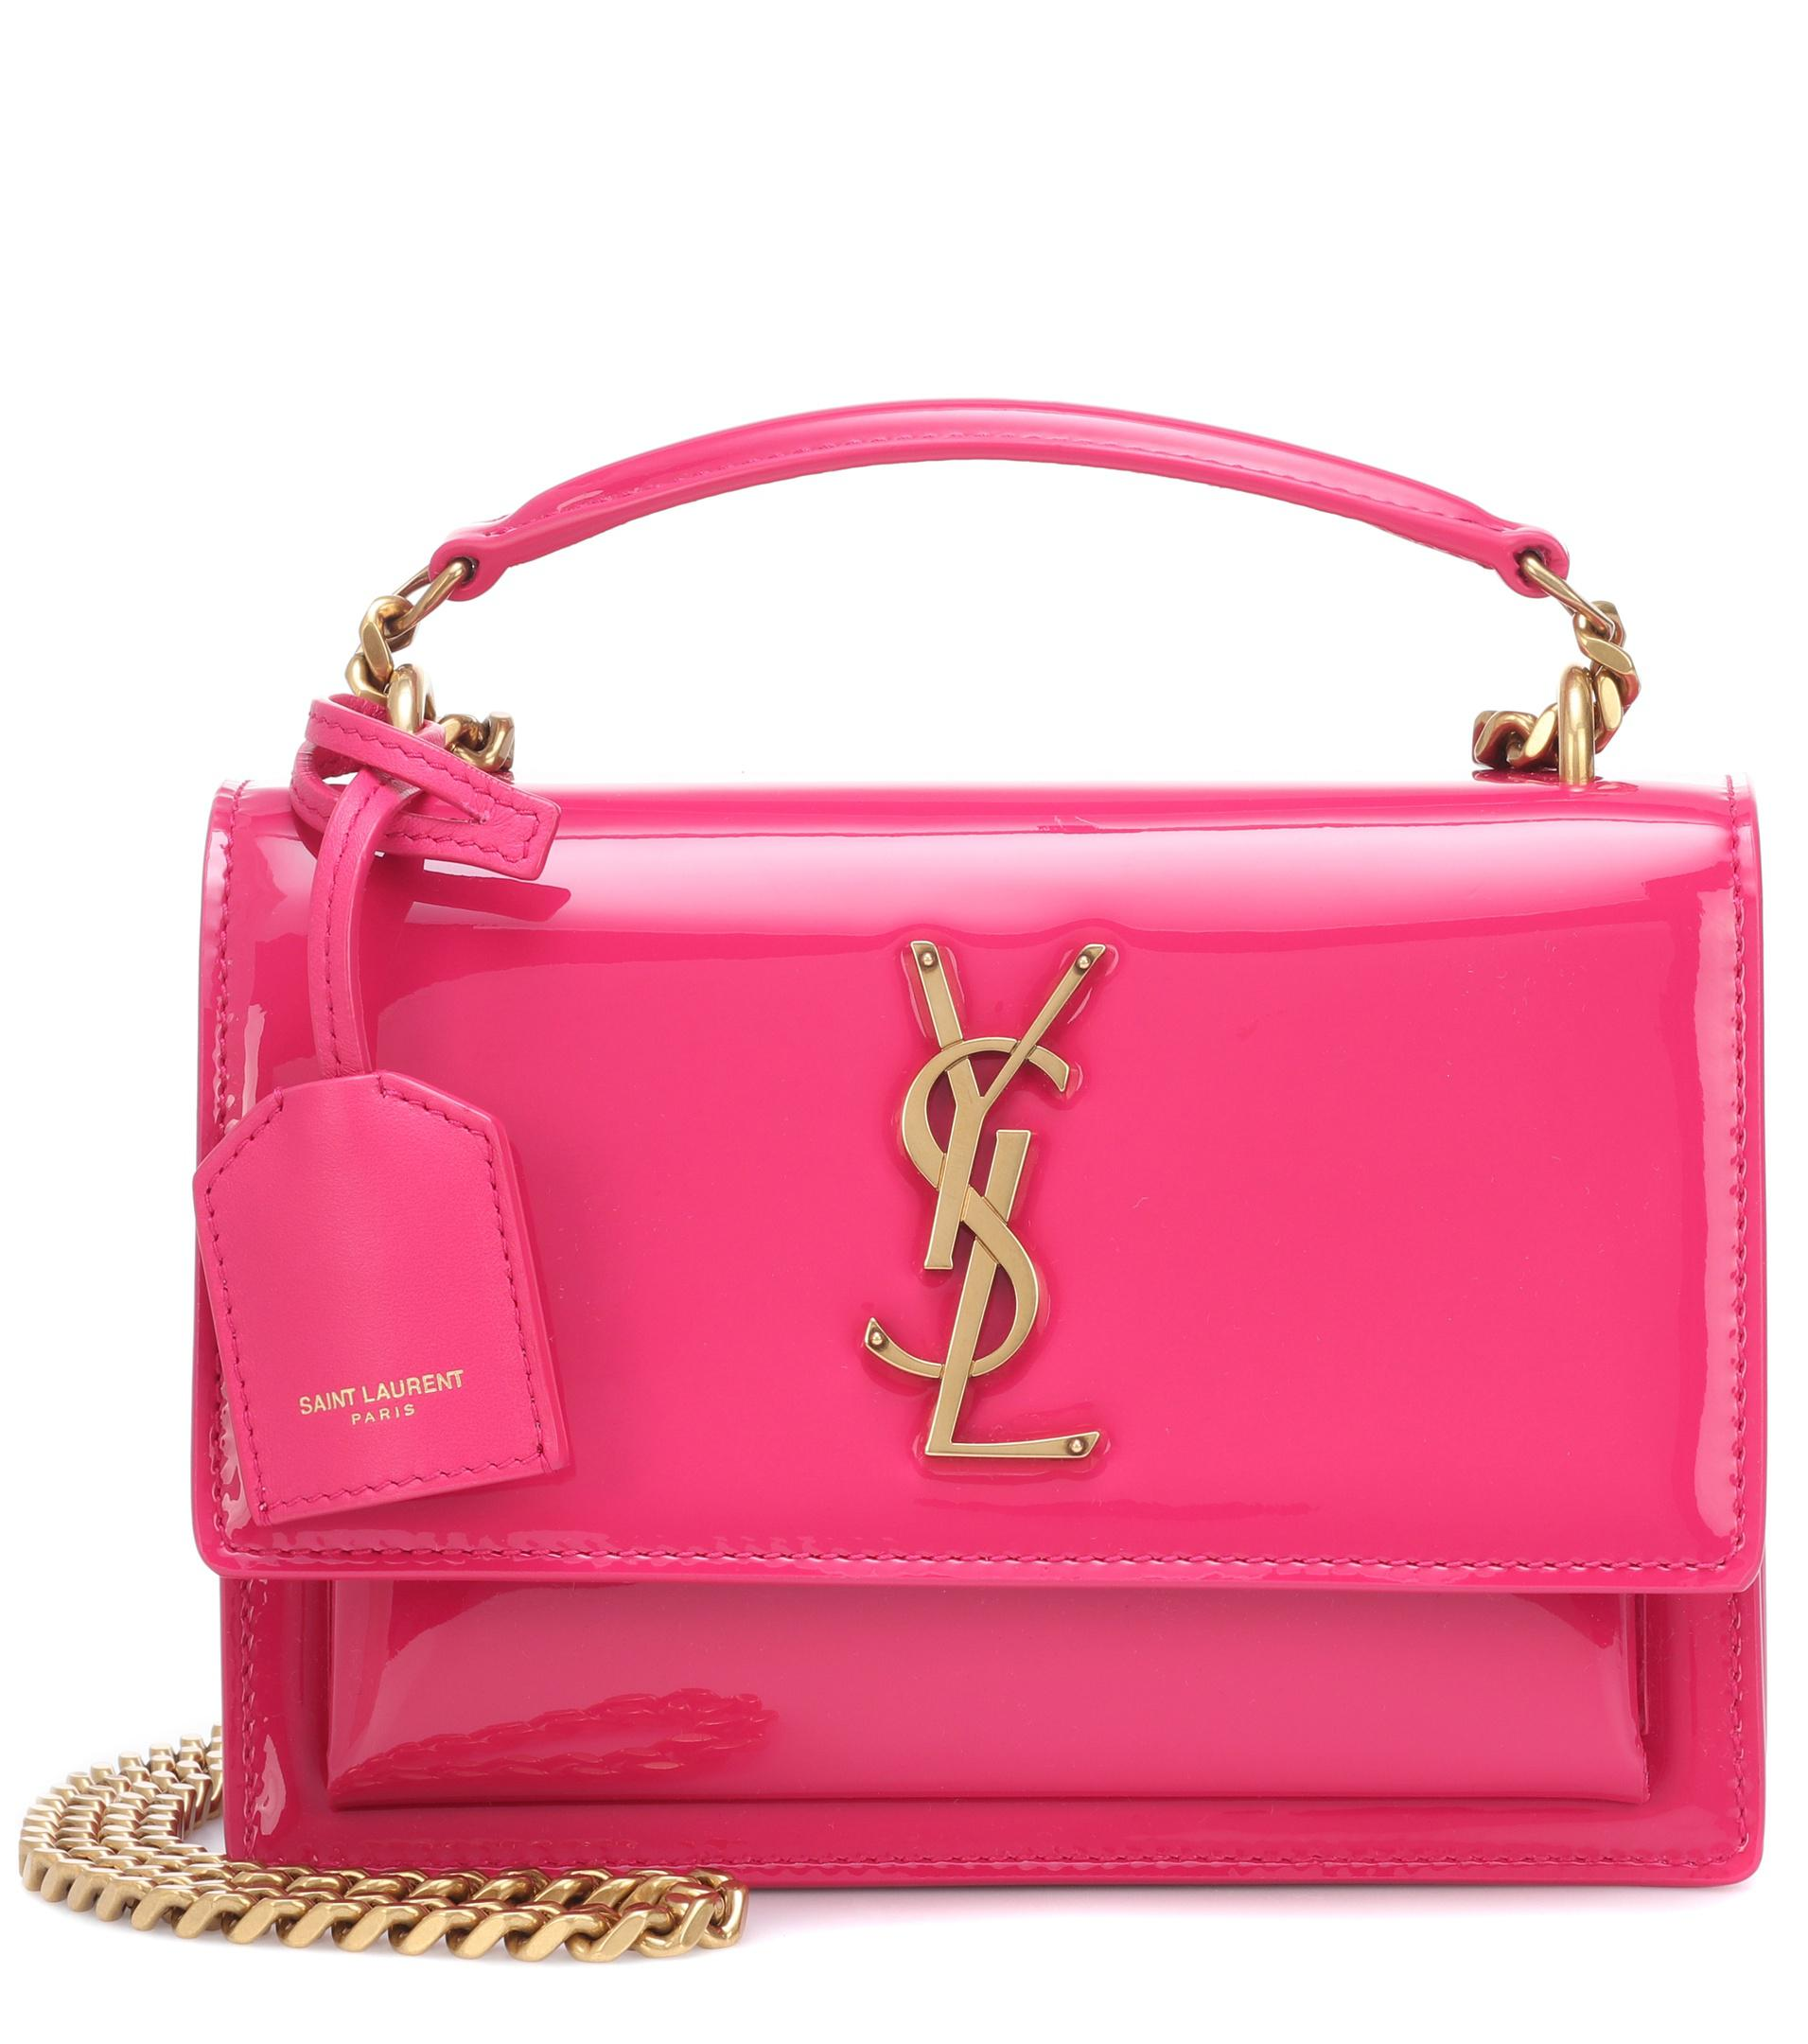 666fec1f9347 Lyst - Saint Laurent Small Sunset Monogram Shoulder Bag in Pink